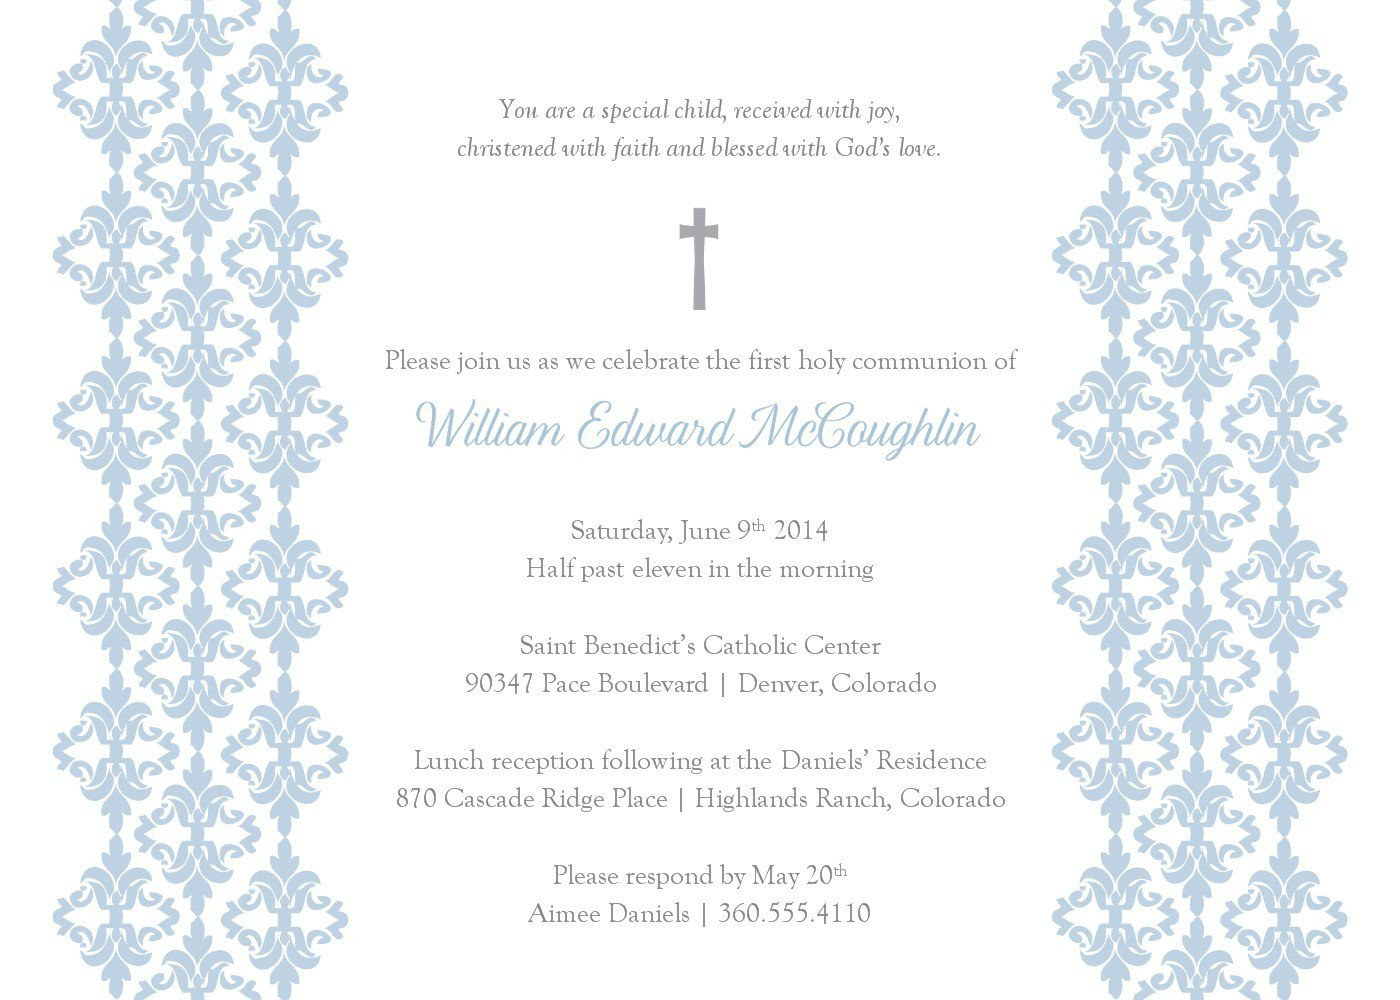 Free Baptism Invitation Templates Baptism Invitation Template Baptism Invitation Card